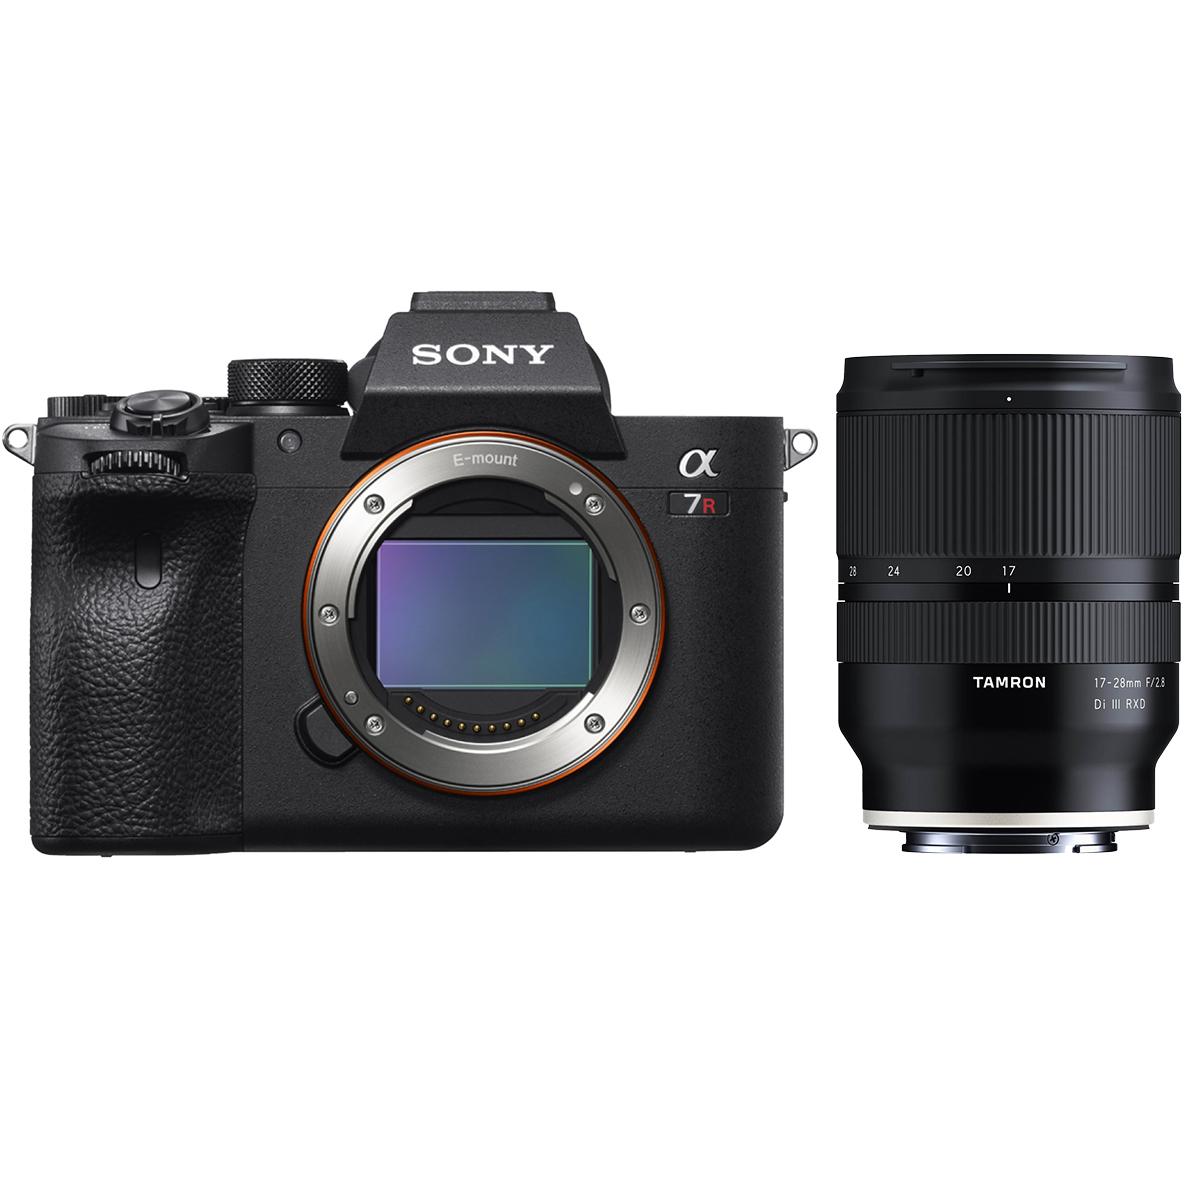 Sony Alpha 7R III Kit mit Tamron 17-28 mm 1:2,8 Di III RXD